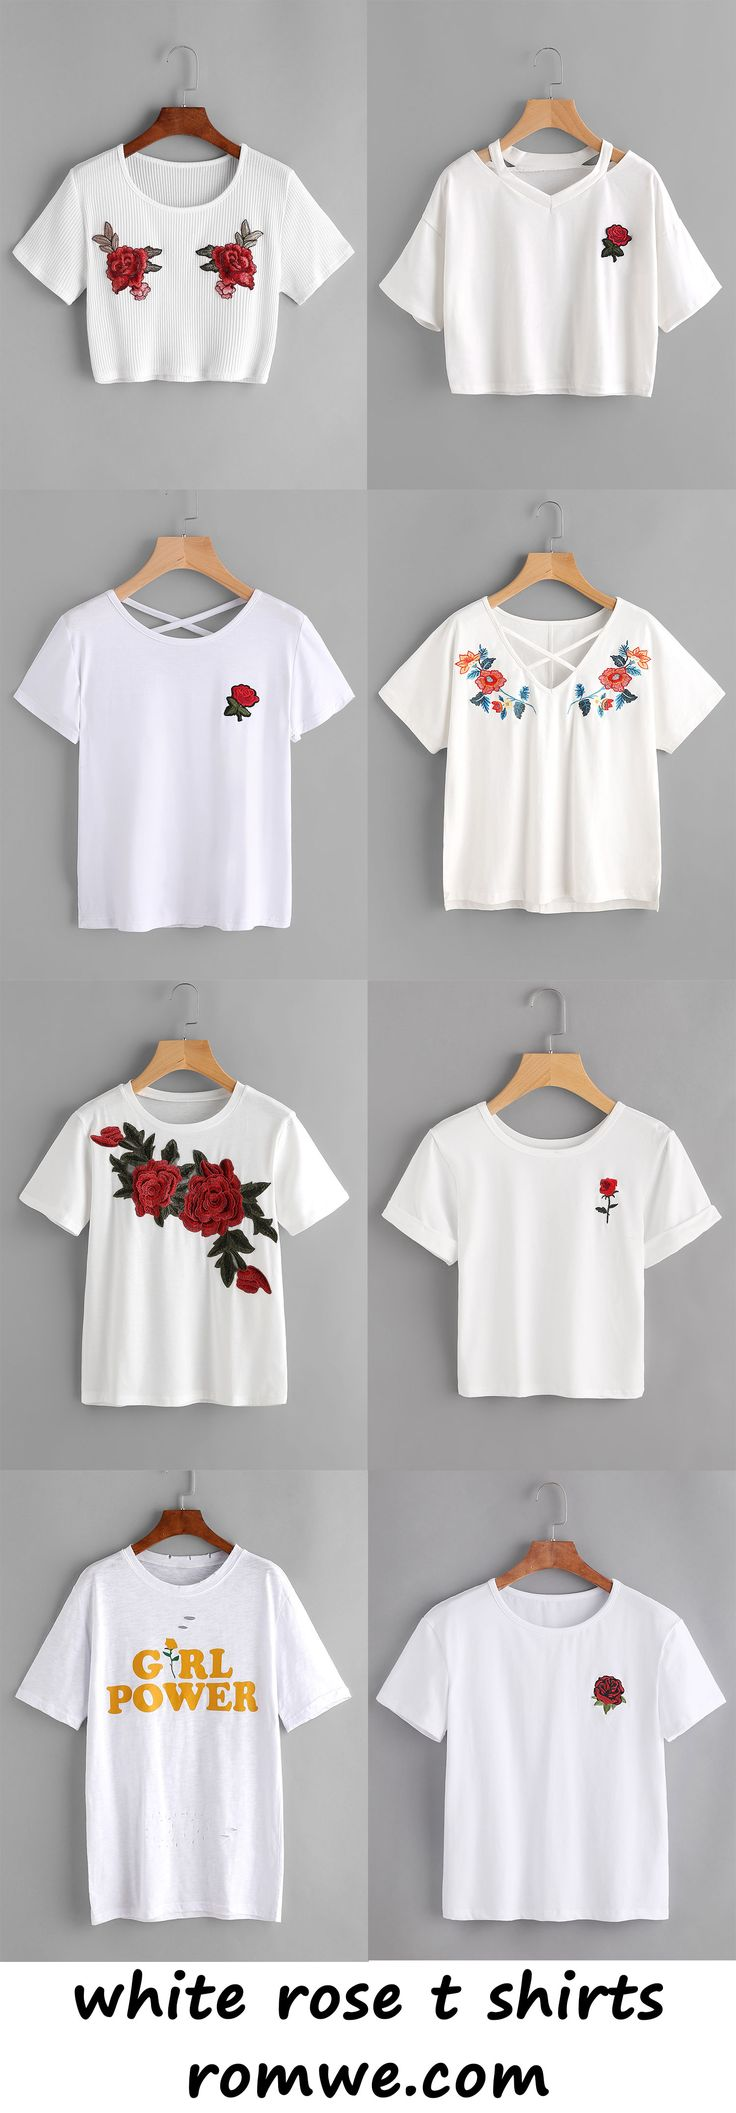 T shirt printing at white rose - White Rose T Shirts Romwe Com